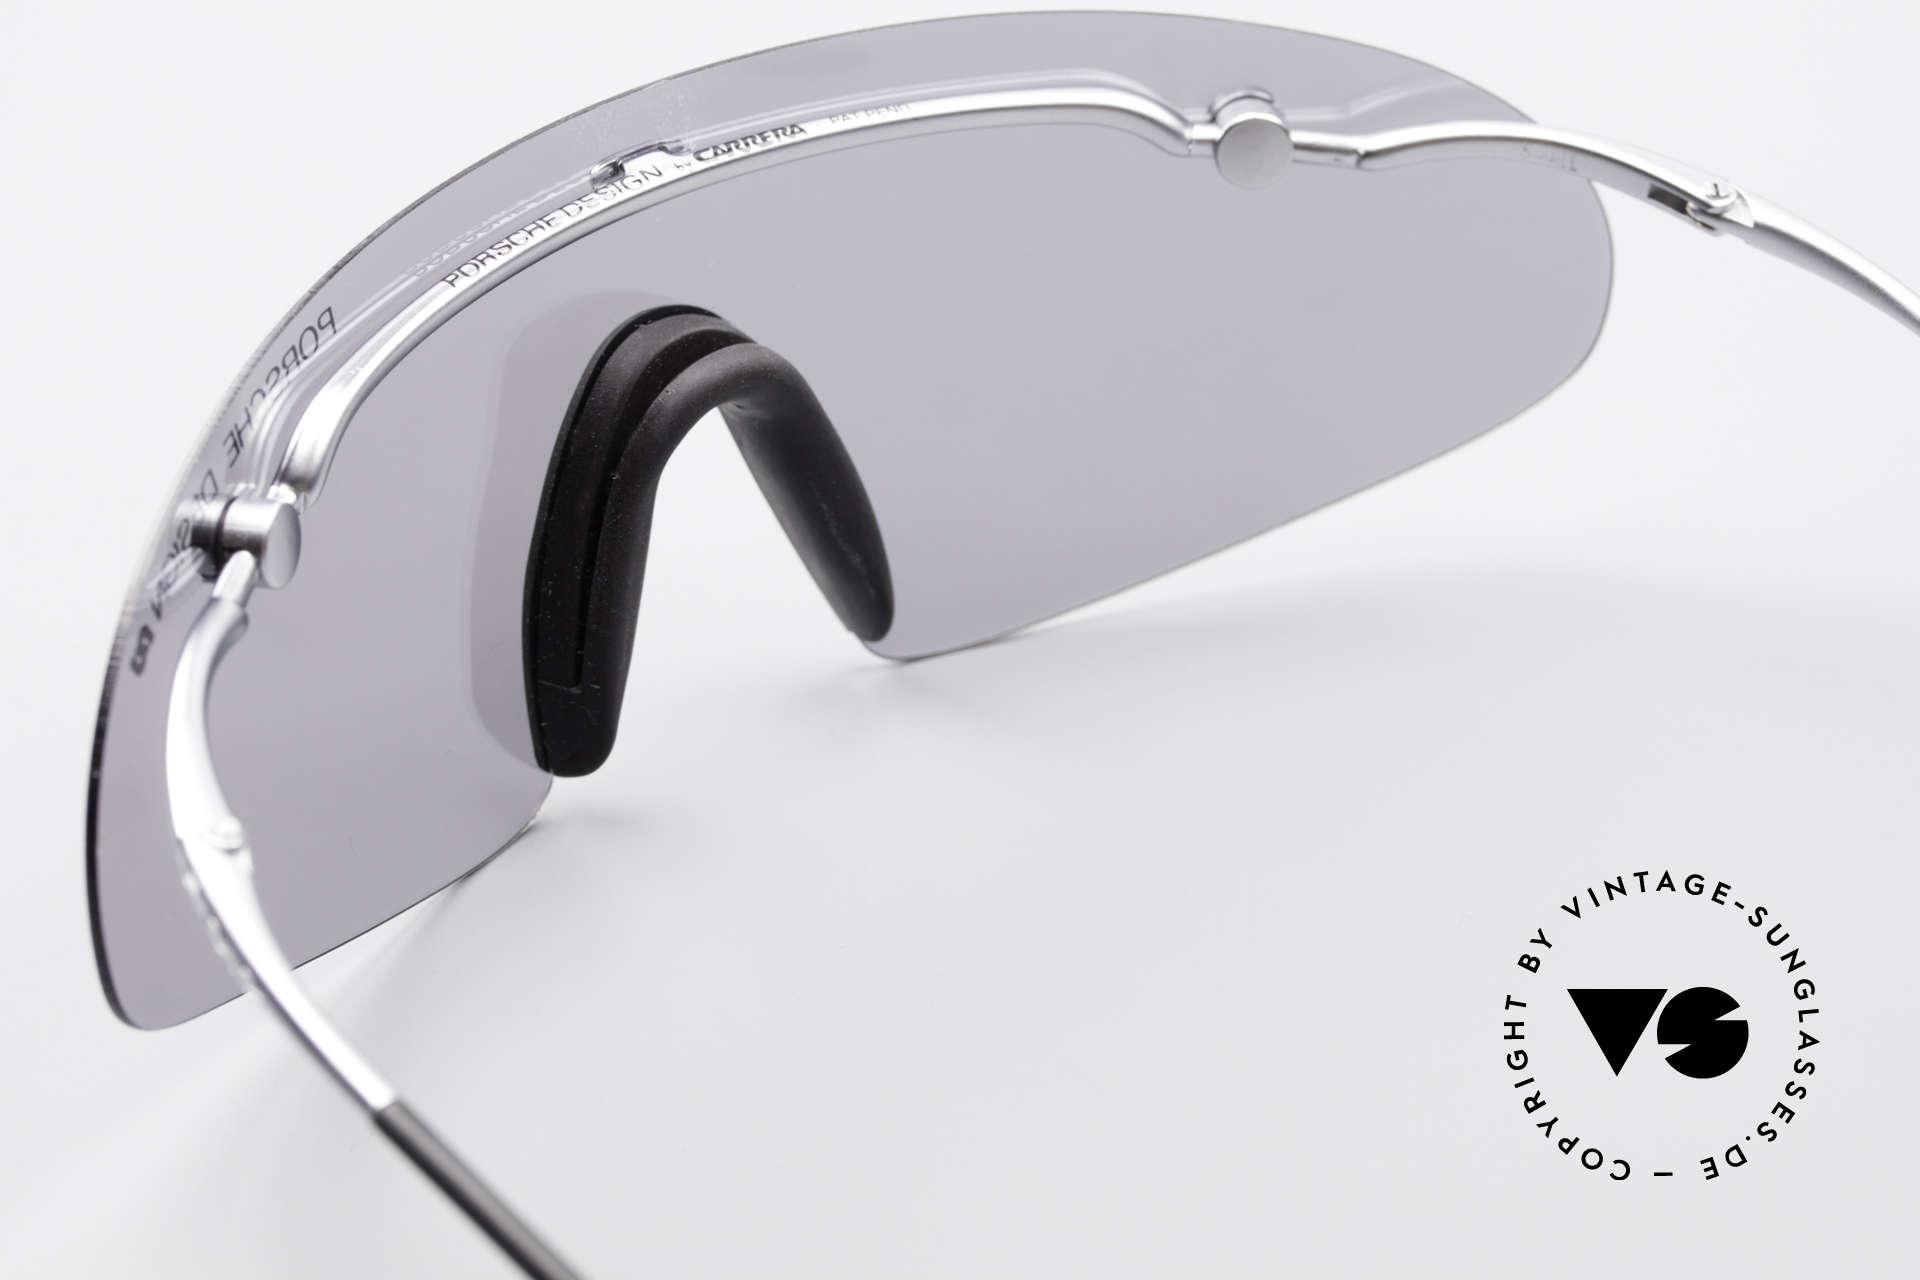 Porsche 5692 F09 Flat Shades Silver Mirrored, NO RETRO sunglasses, but a genuine unworn ORIGINAL!, Made for Men